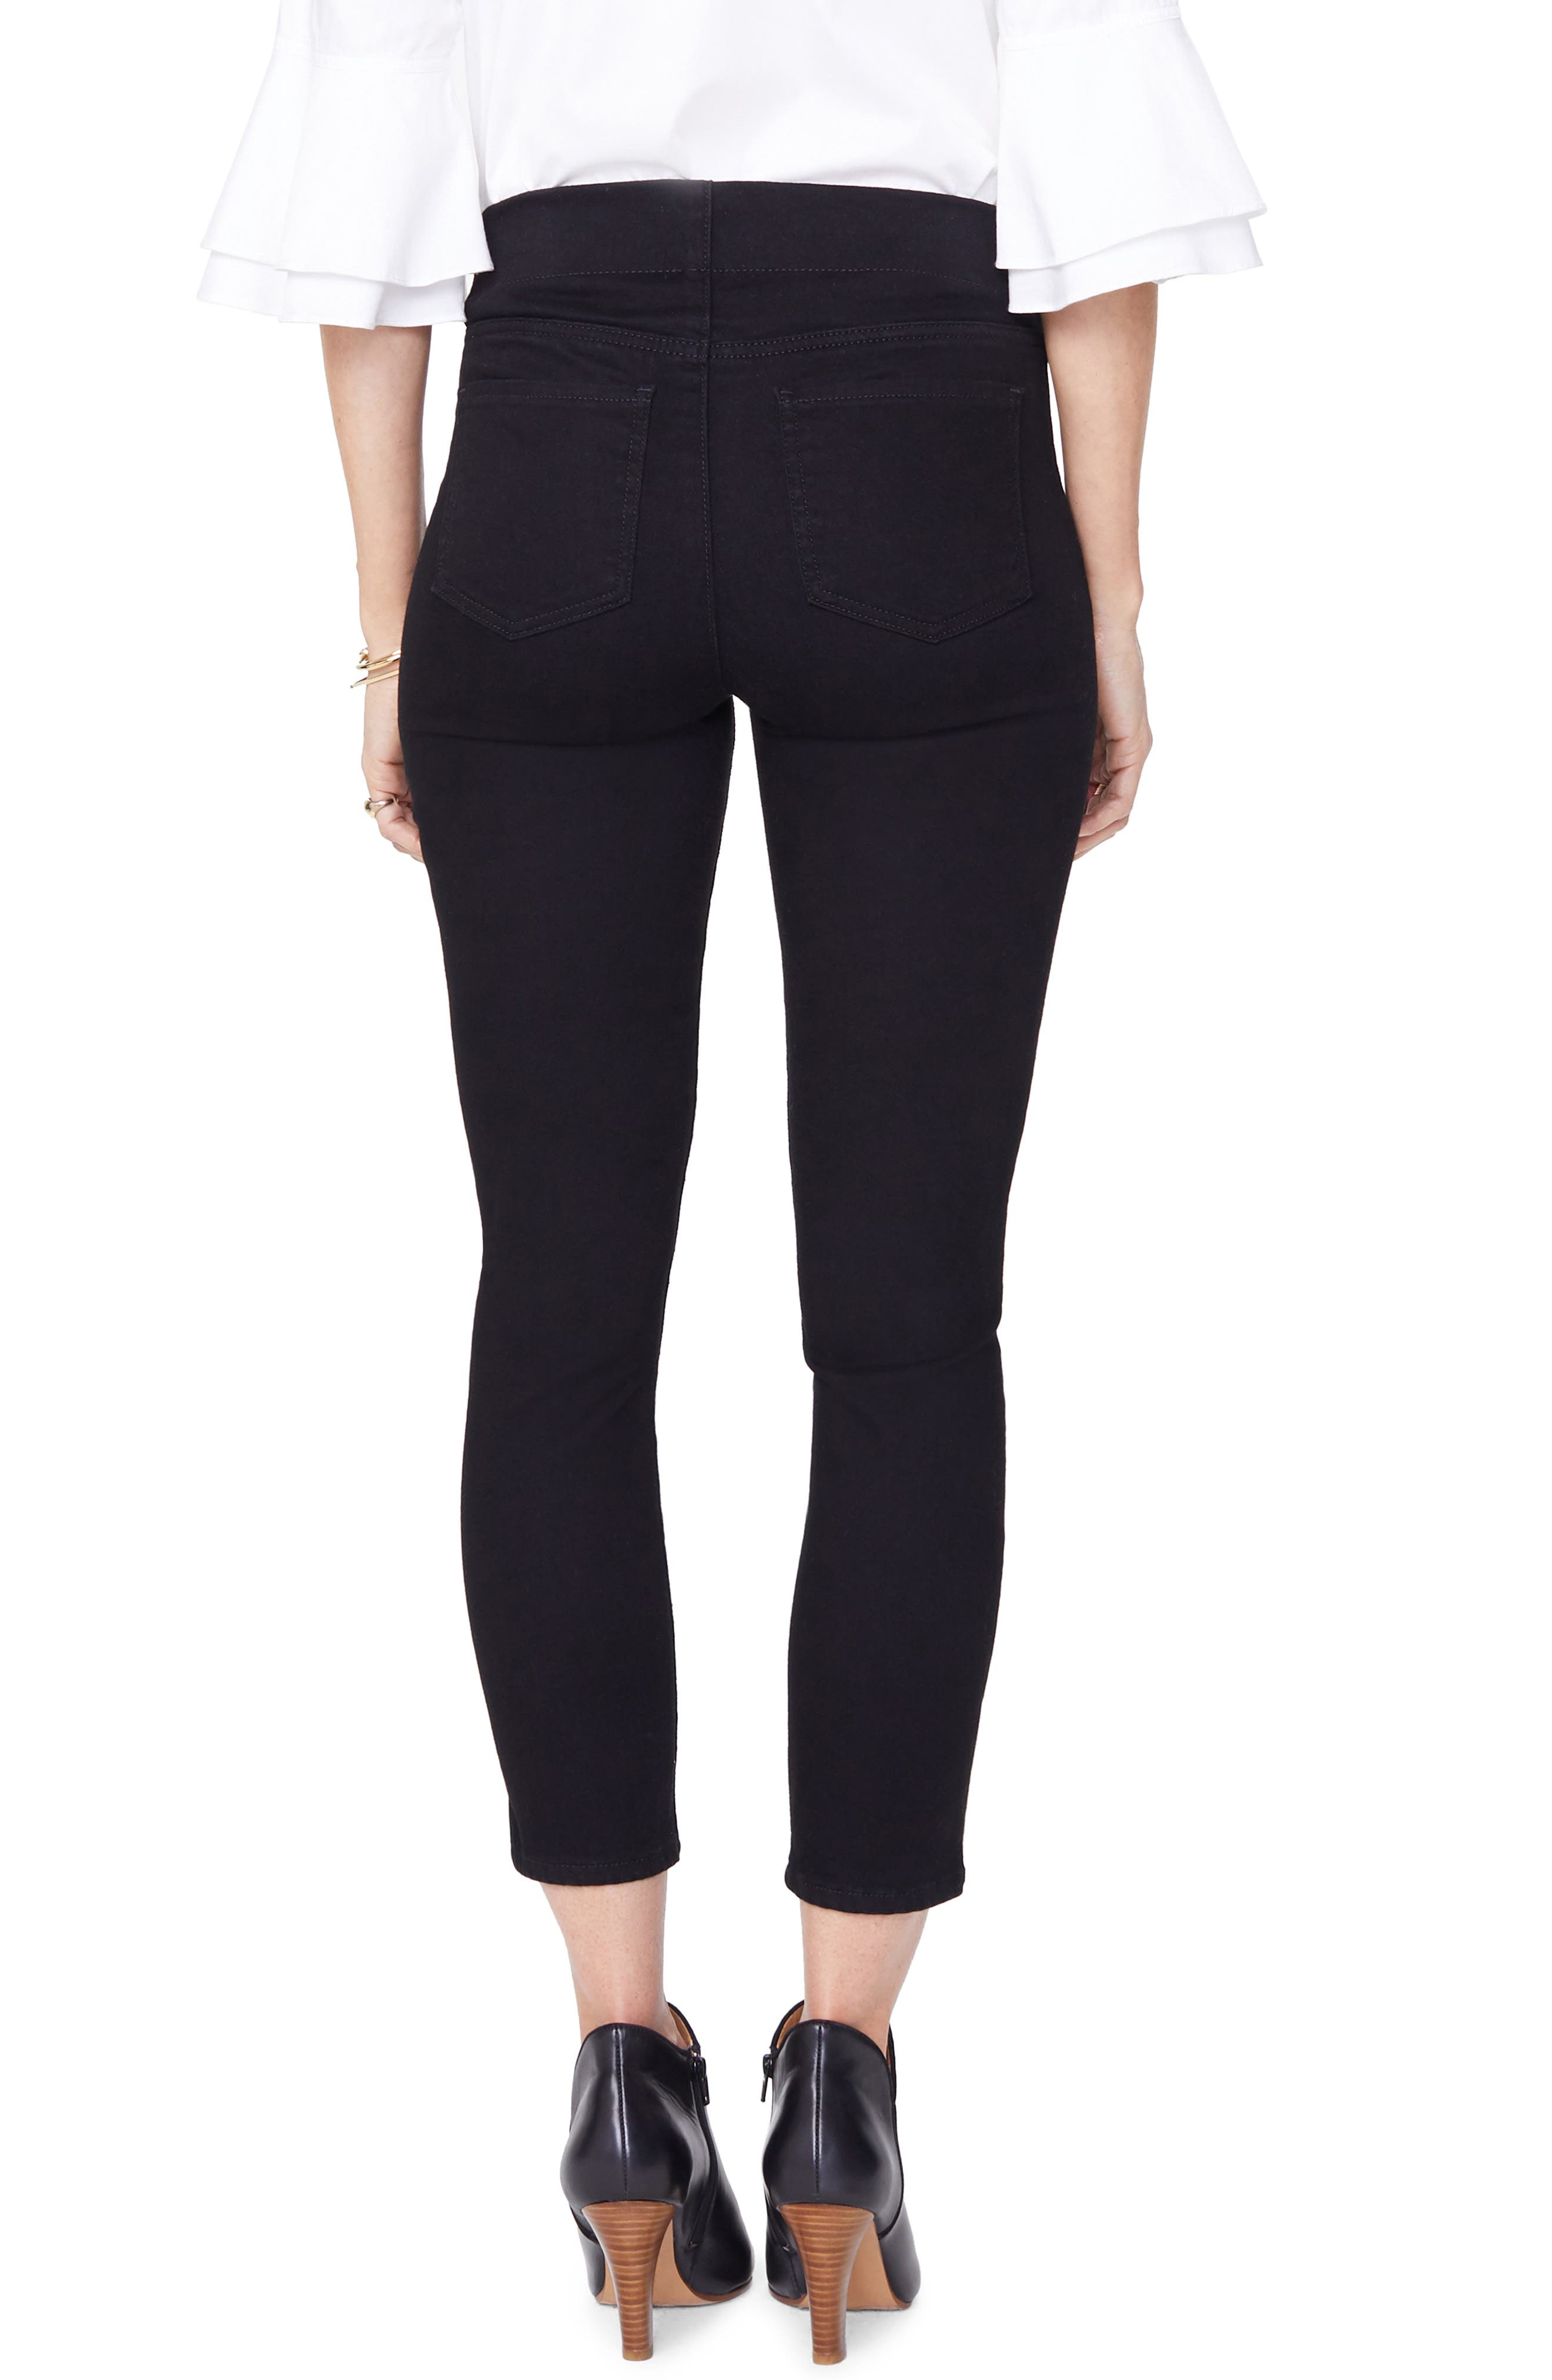 Alina High Waist Pull-On Ankle Skinny Jeans,                             Alternate thumbnail 2, color,                             BLACK